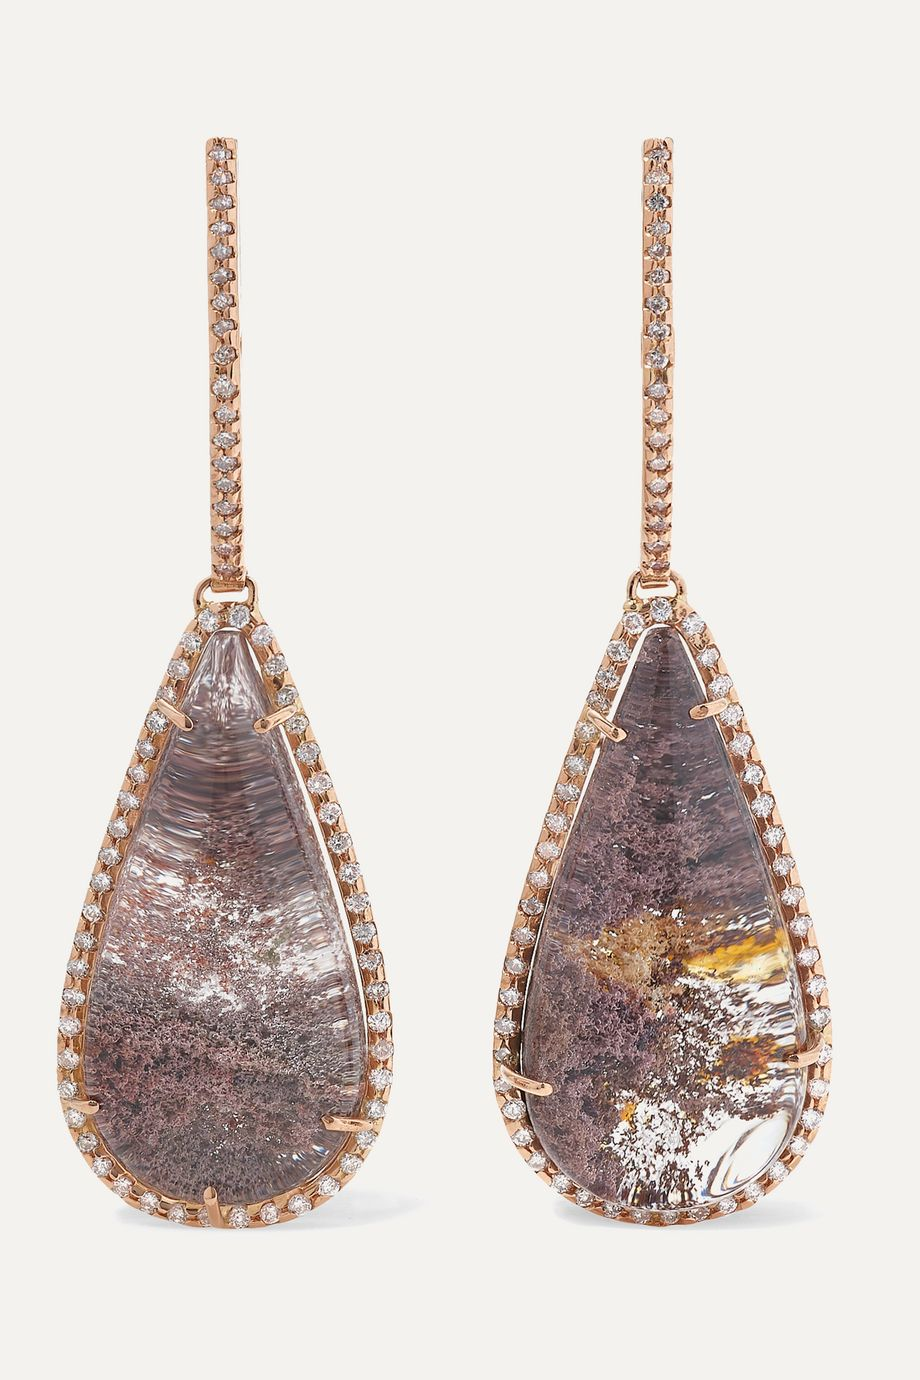 Kimberly McDonald 18-karat rose gold, quartz and diamond earrings